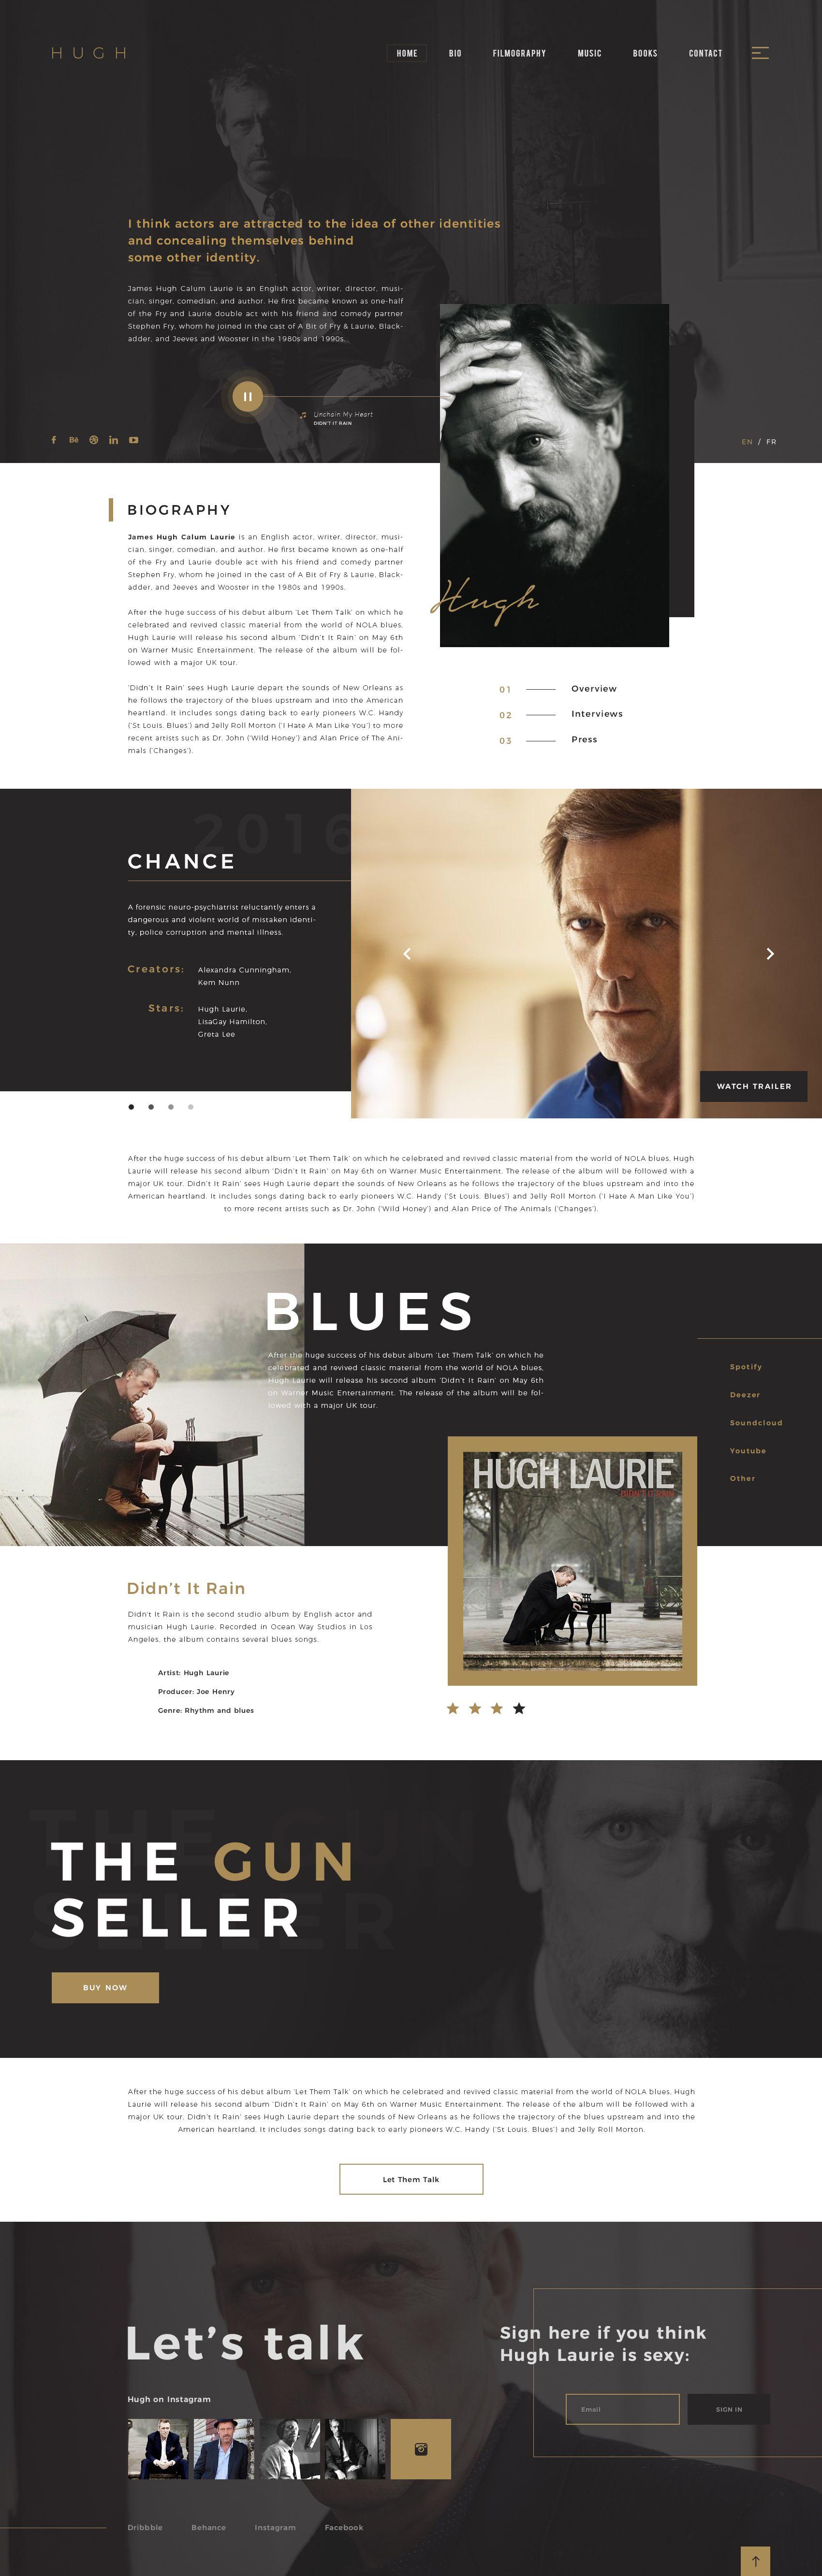 Hugh Personal Website Personal Website Design Magazine Website Design Minimal Web Design